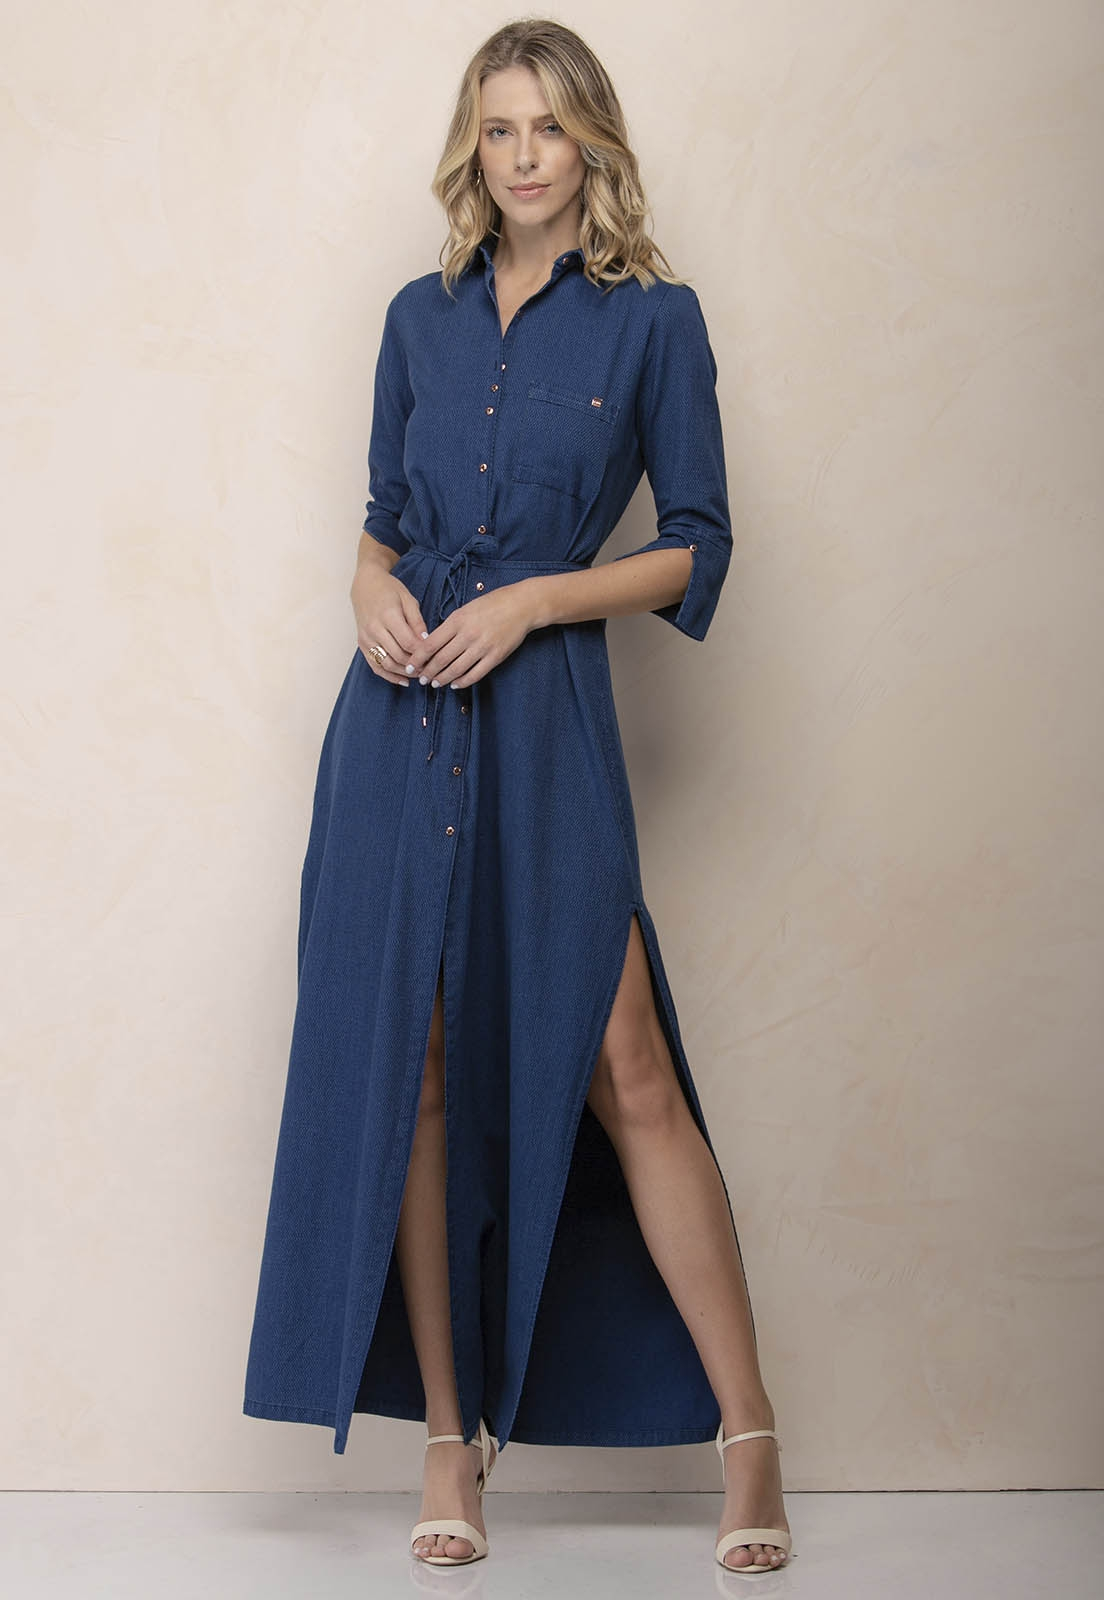 Vestido Jeans Shirtdress Zaiko 2525